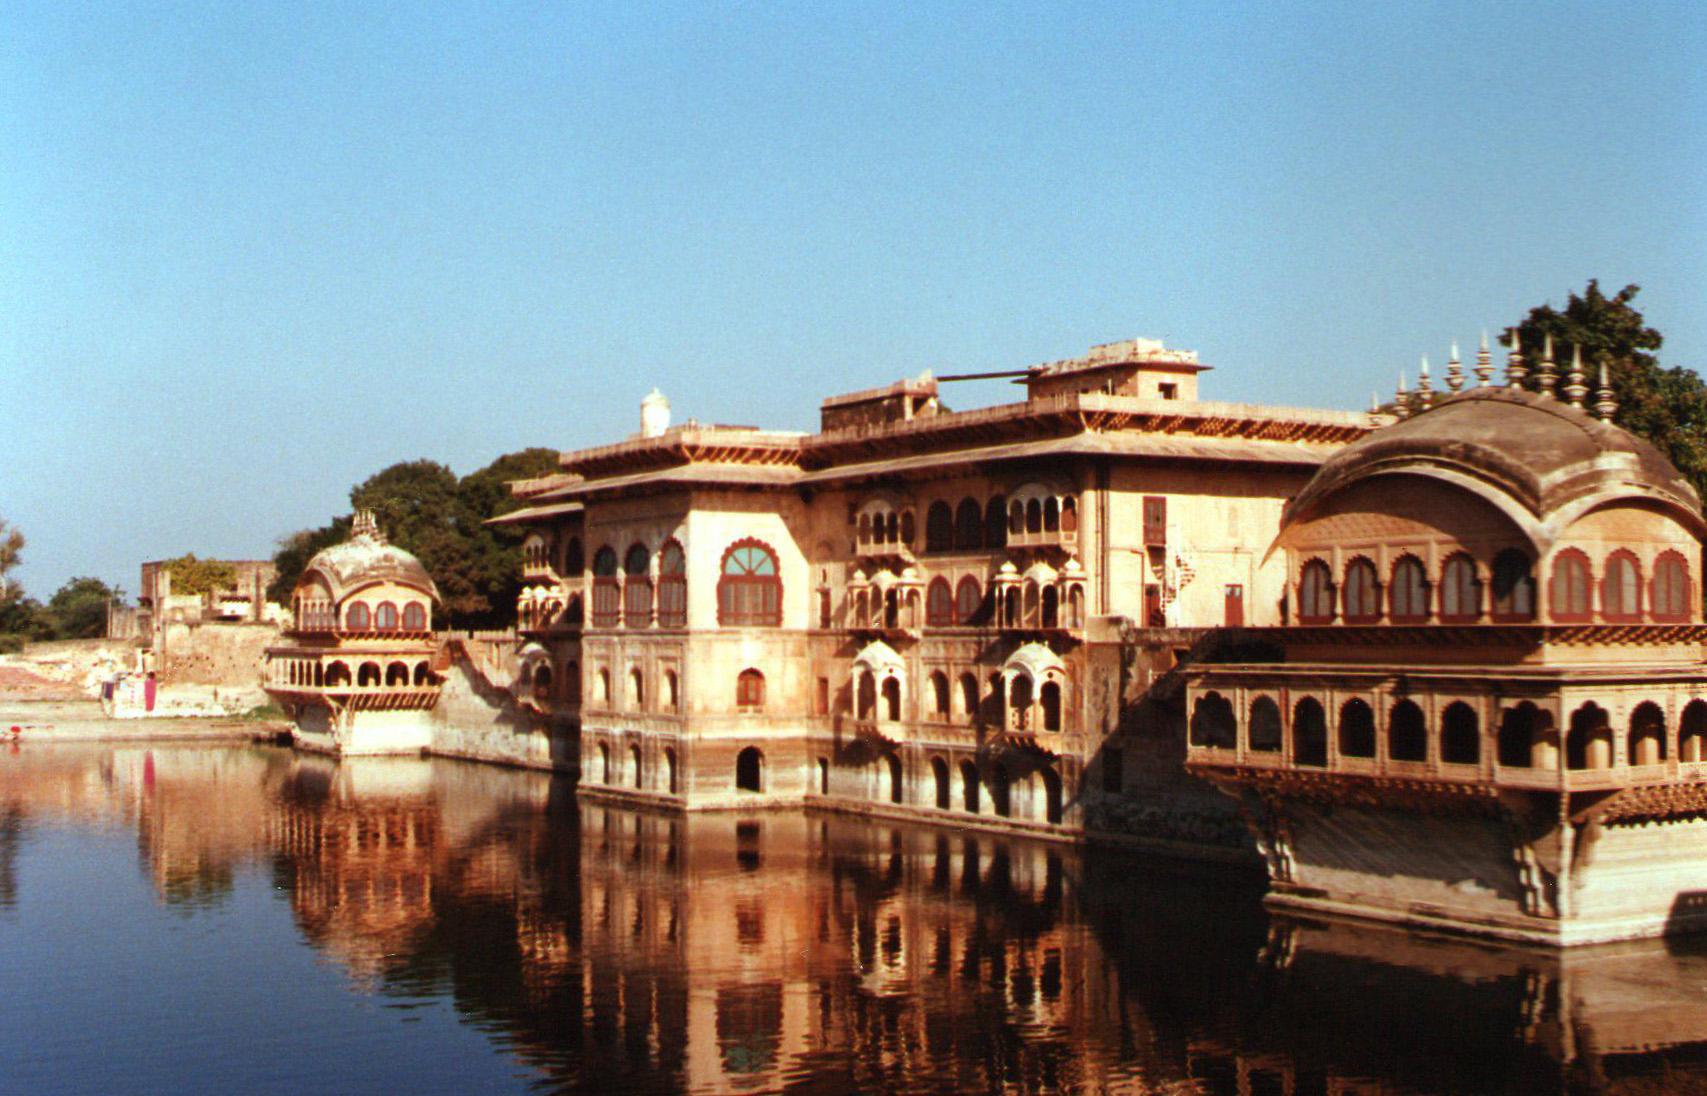 http://www.getbookcab.com/Admin/images/Bharatpur.jpg